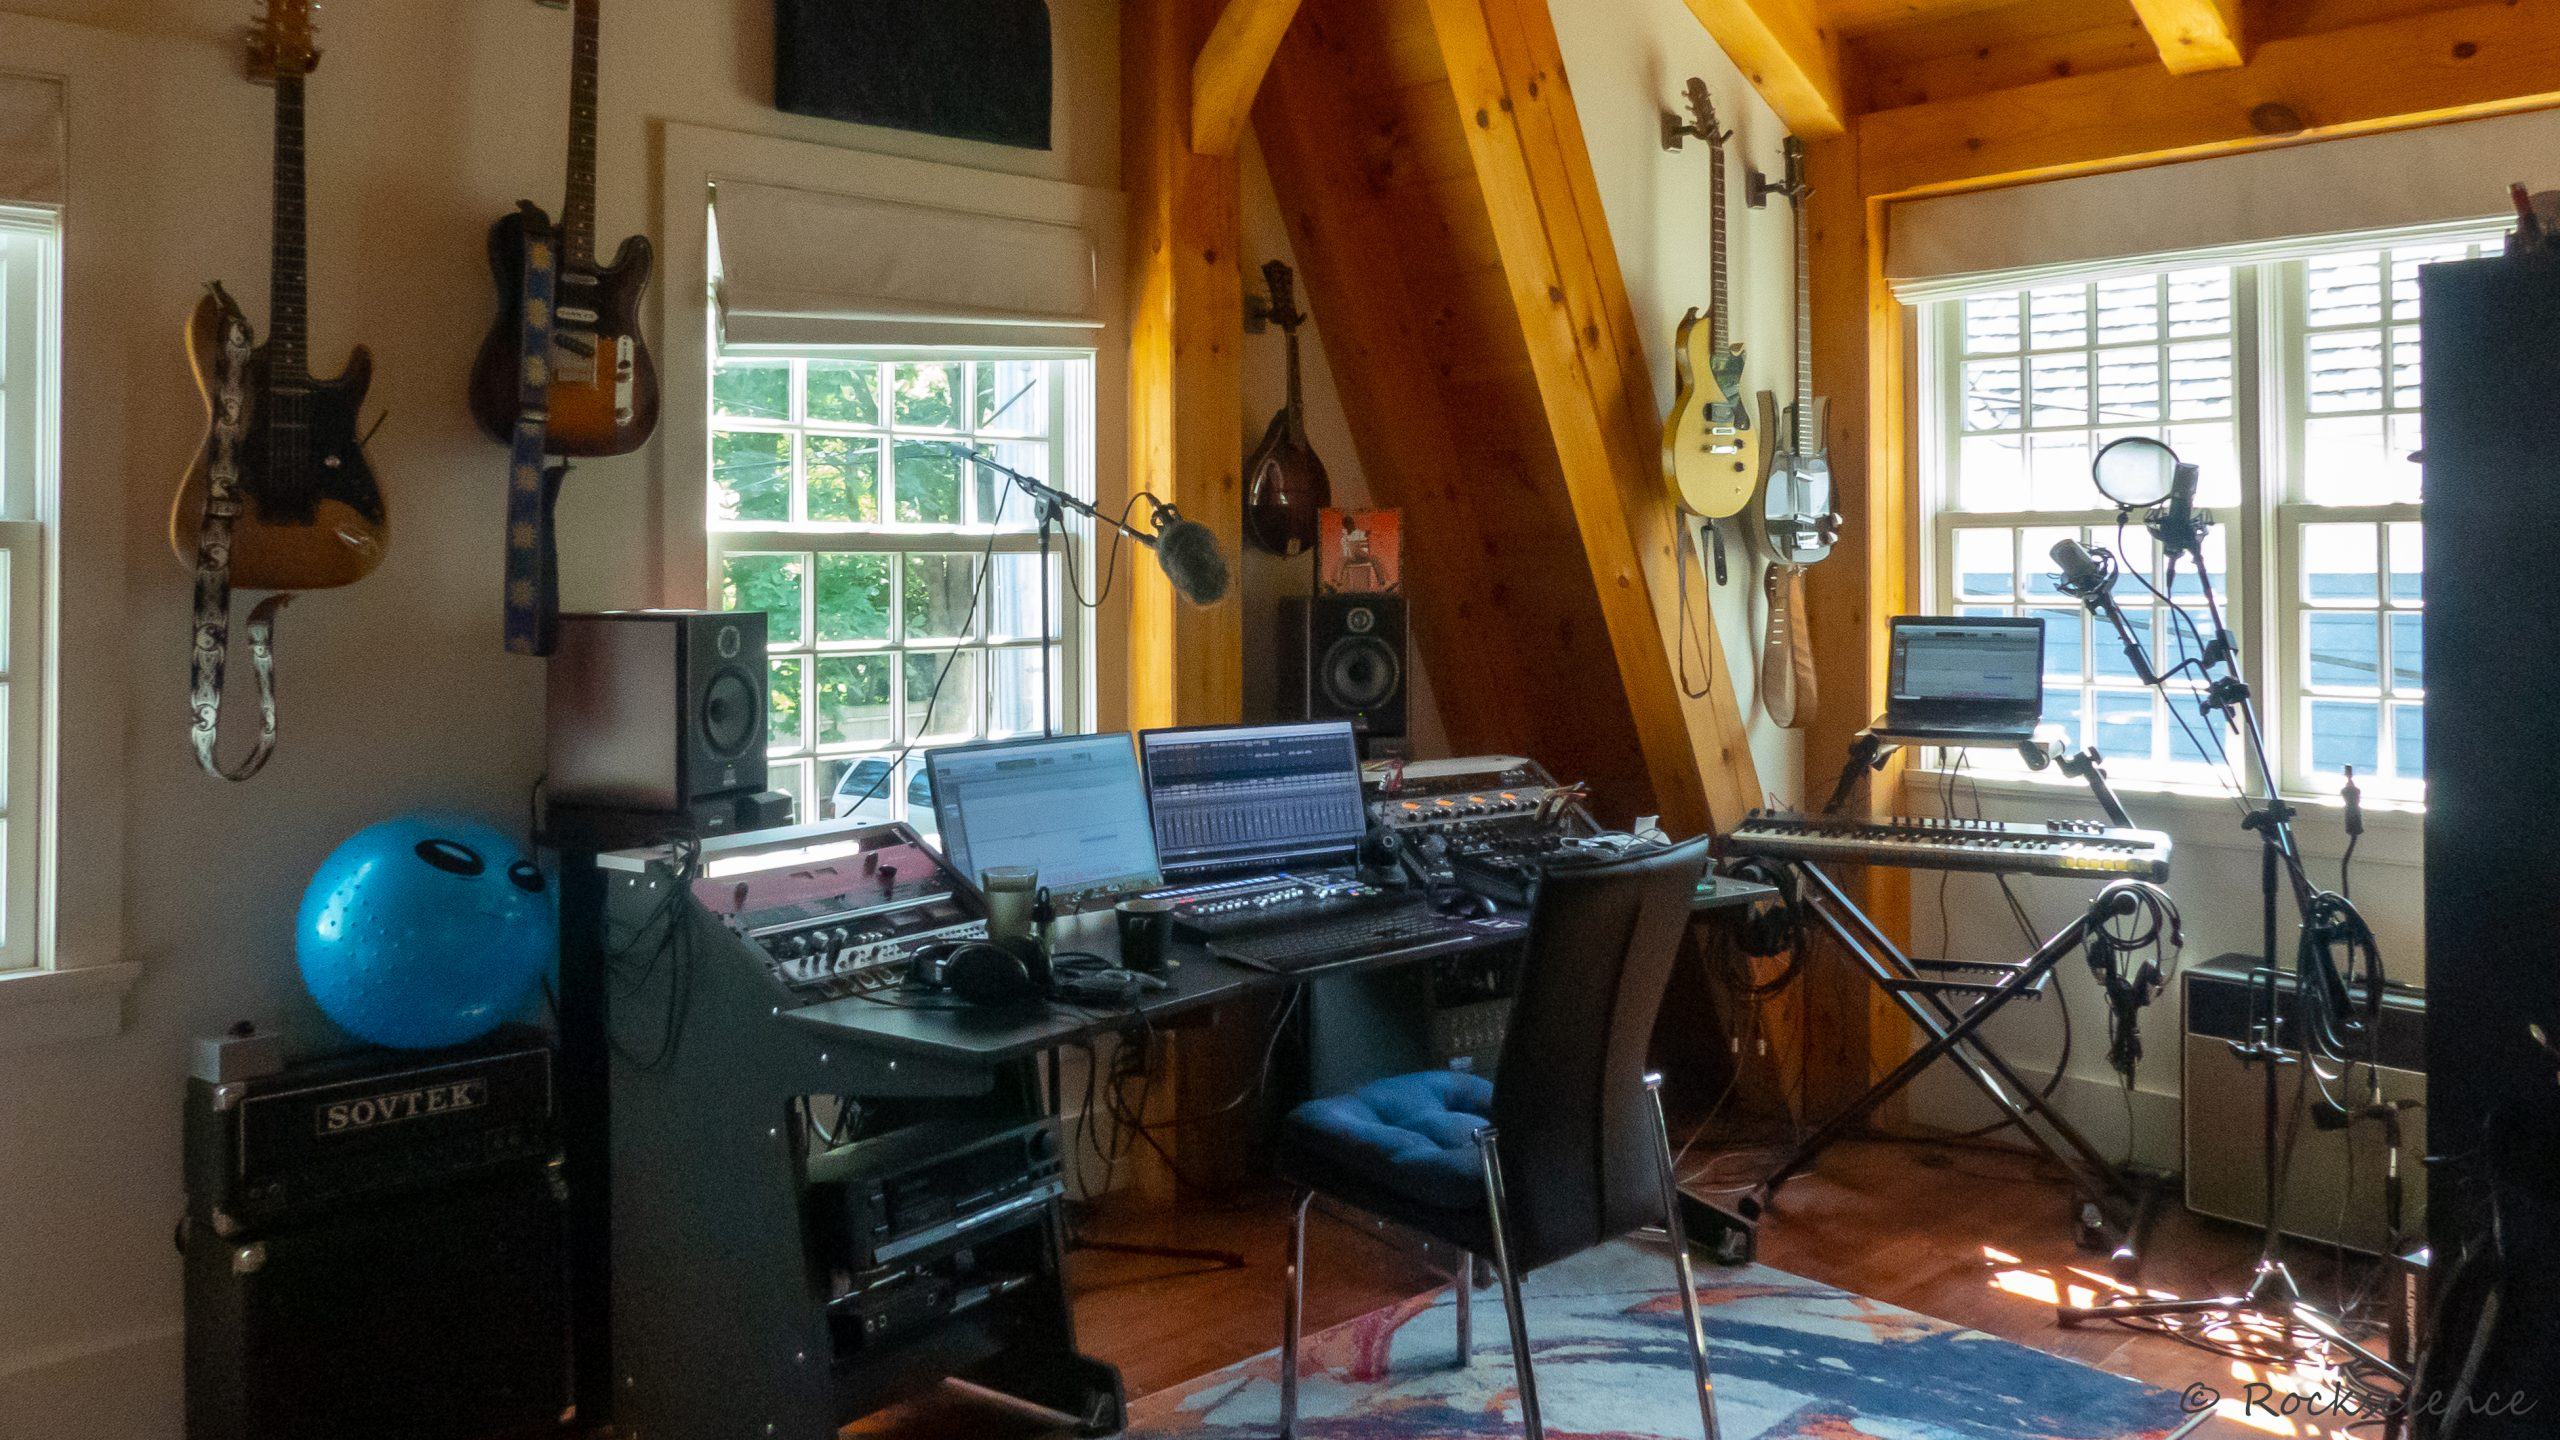 rock science mix room